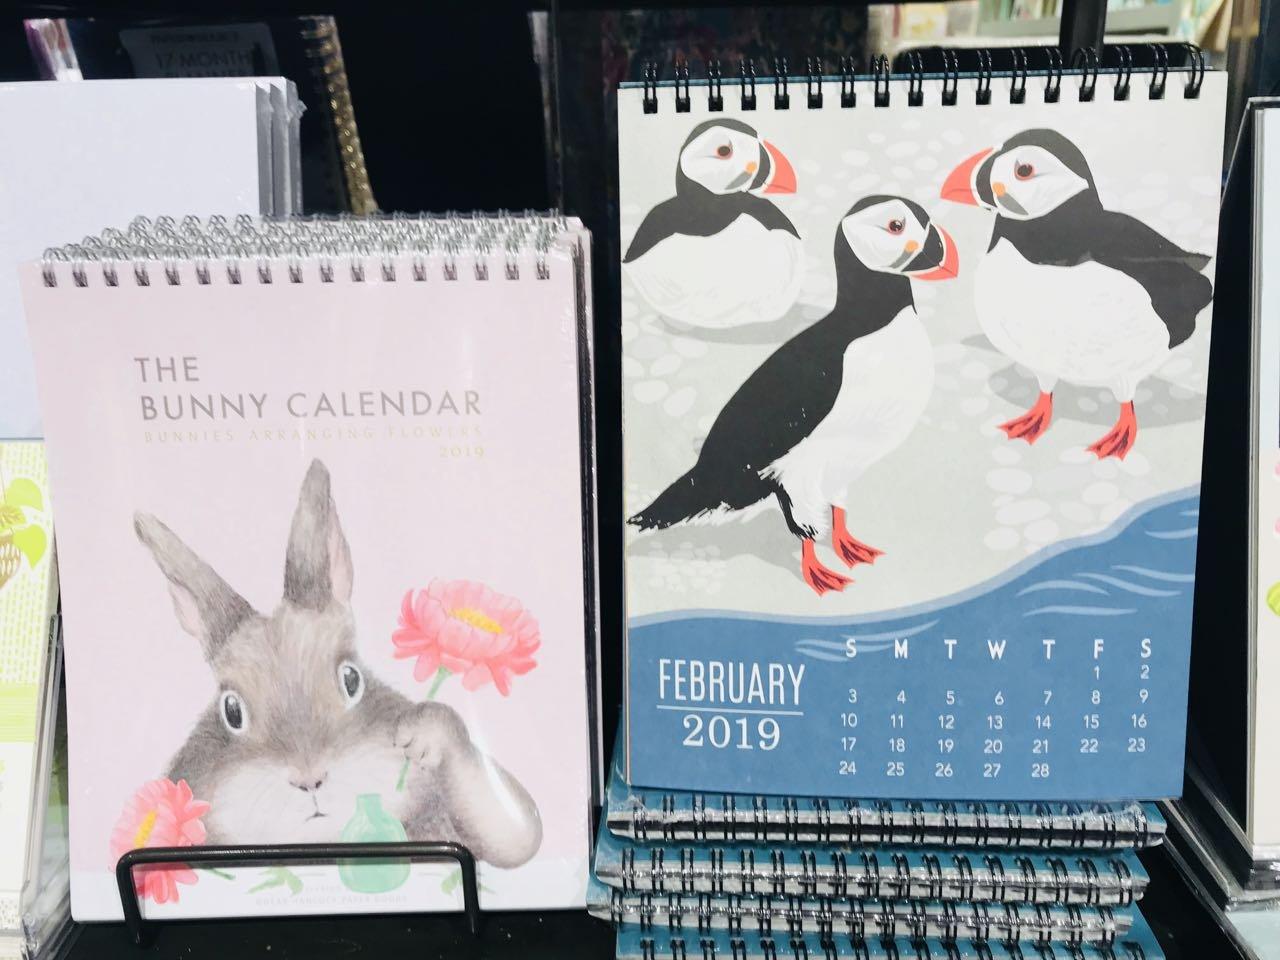 2019 Calendars On Sale, And Selling Calendar 2019 Sale